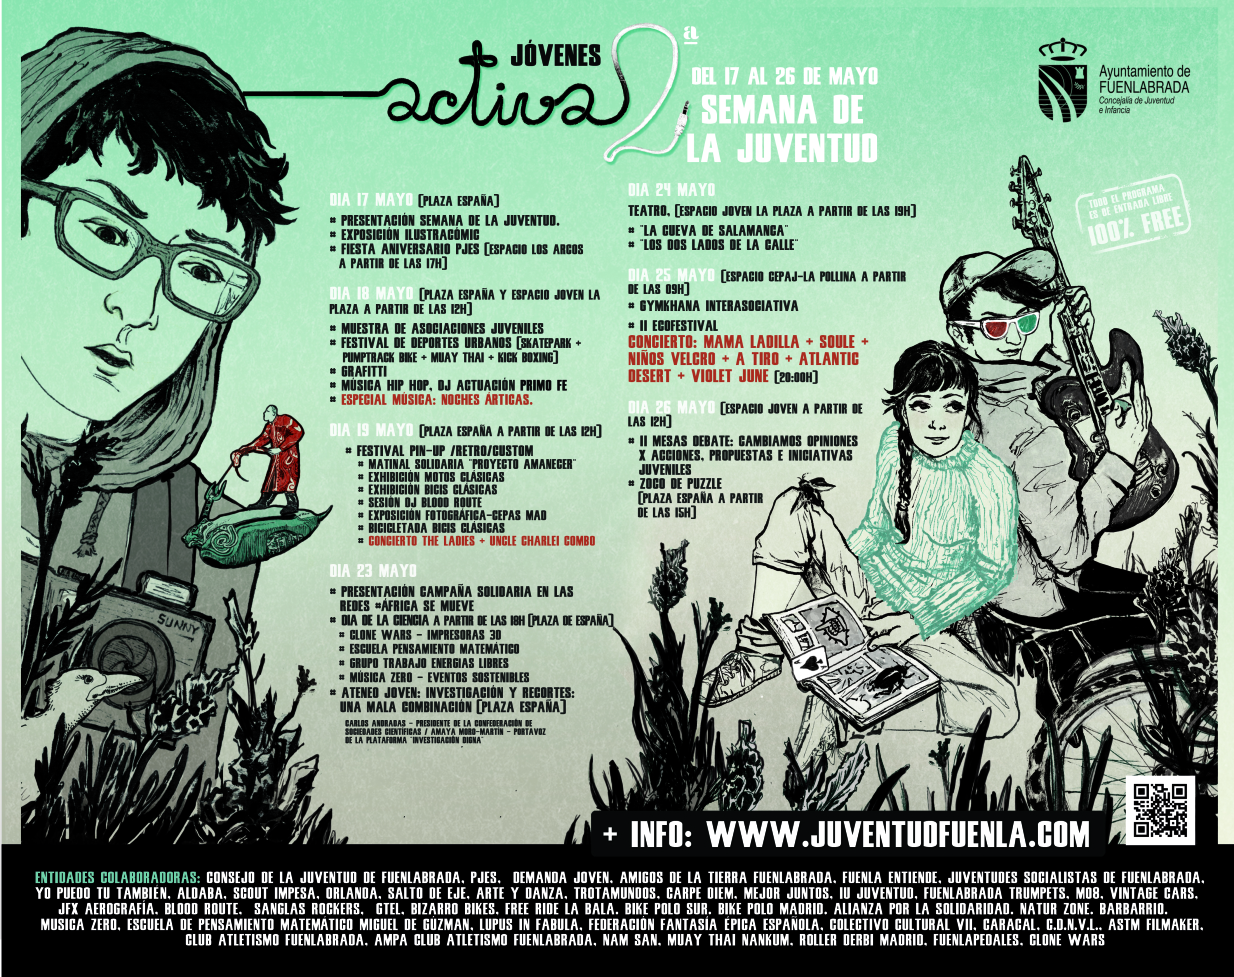 "2ª Semana de la Juventud ""Jóvenes Activa2"" - Cartel Juan"